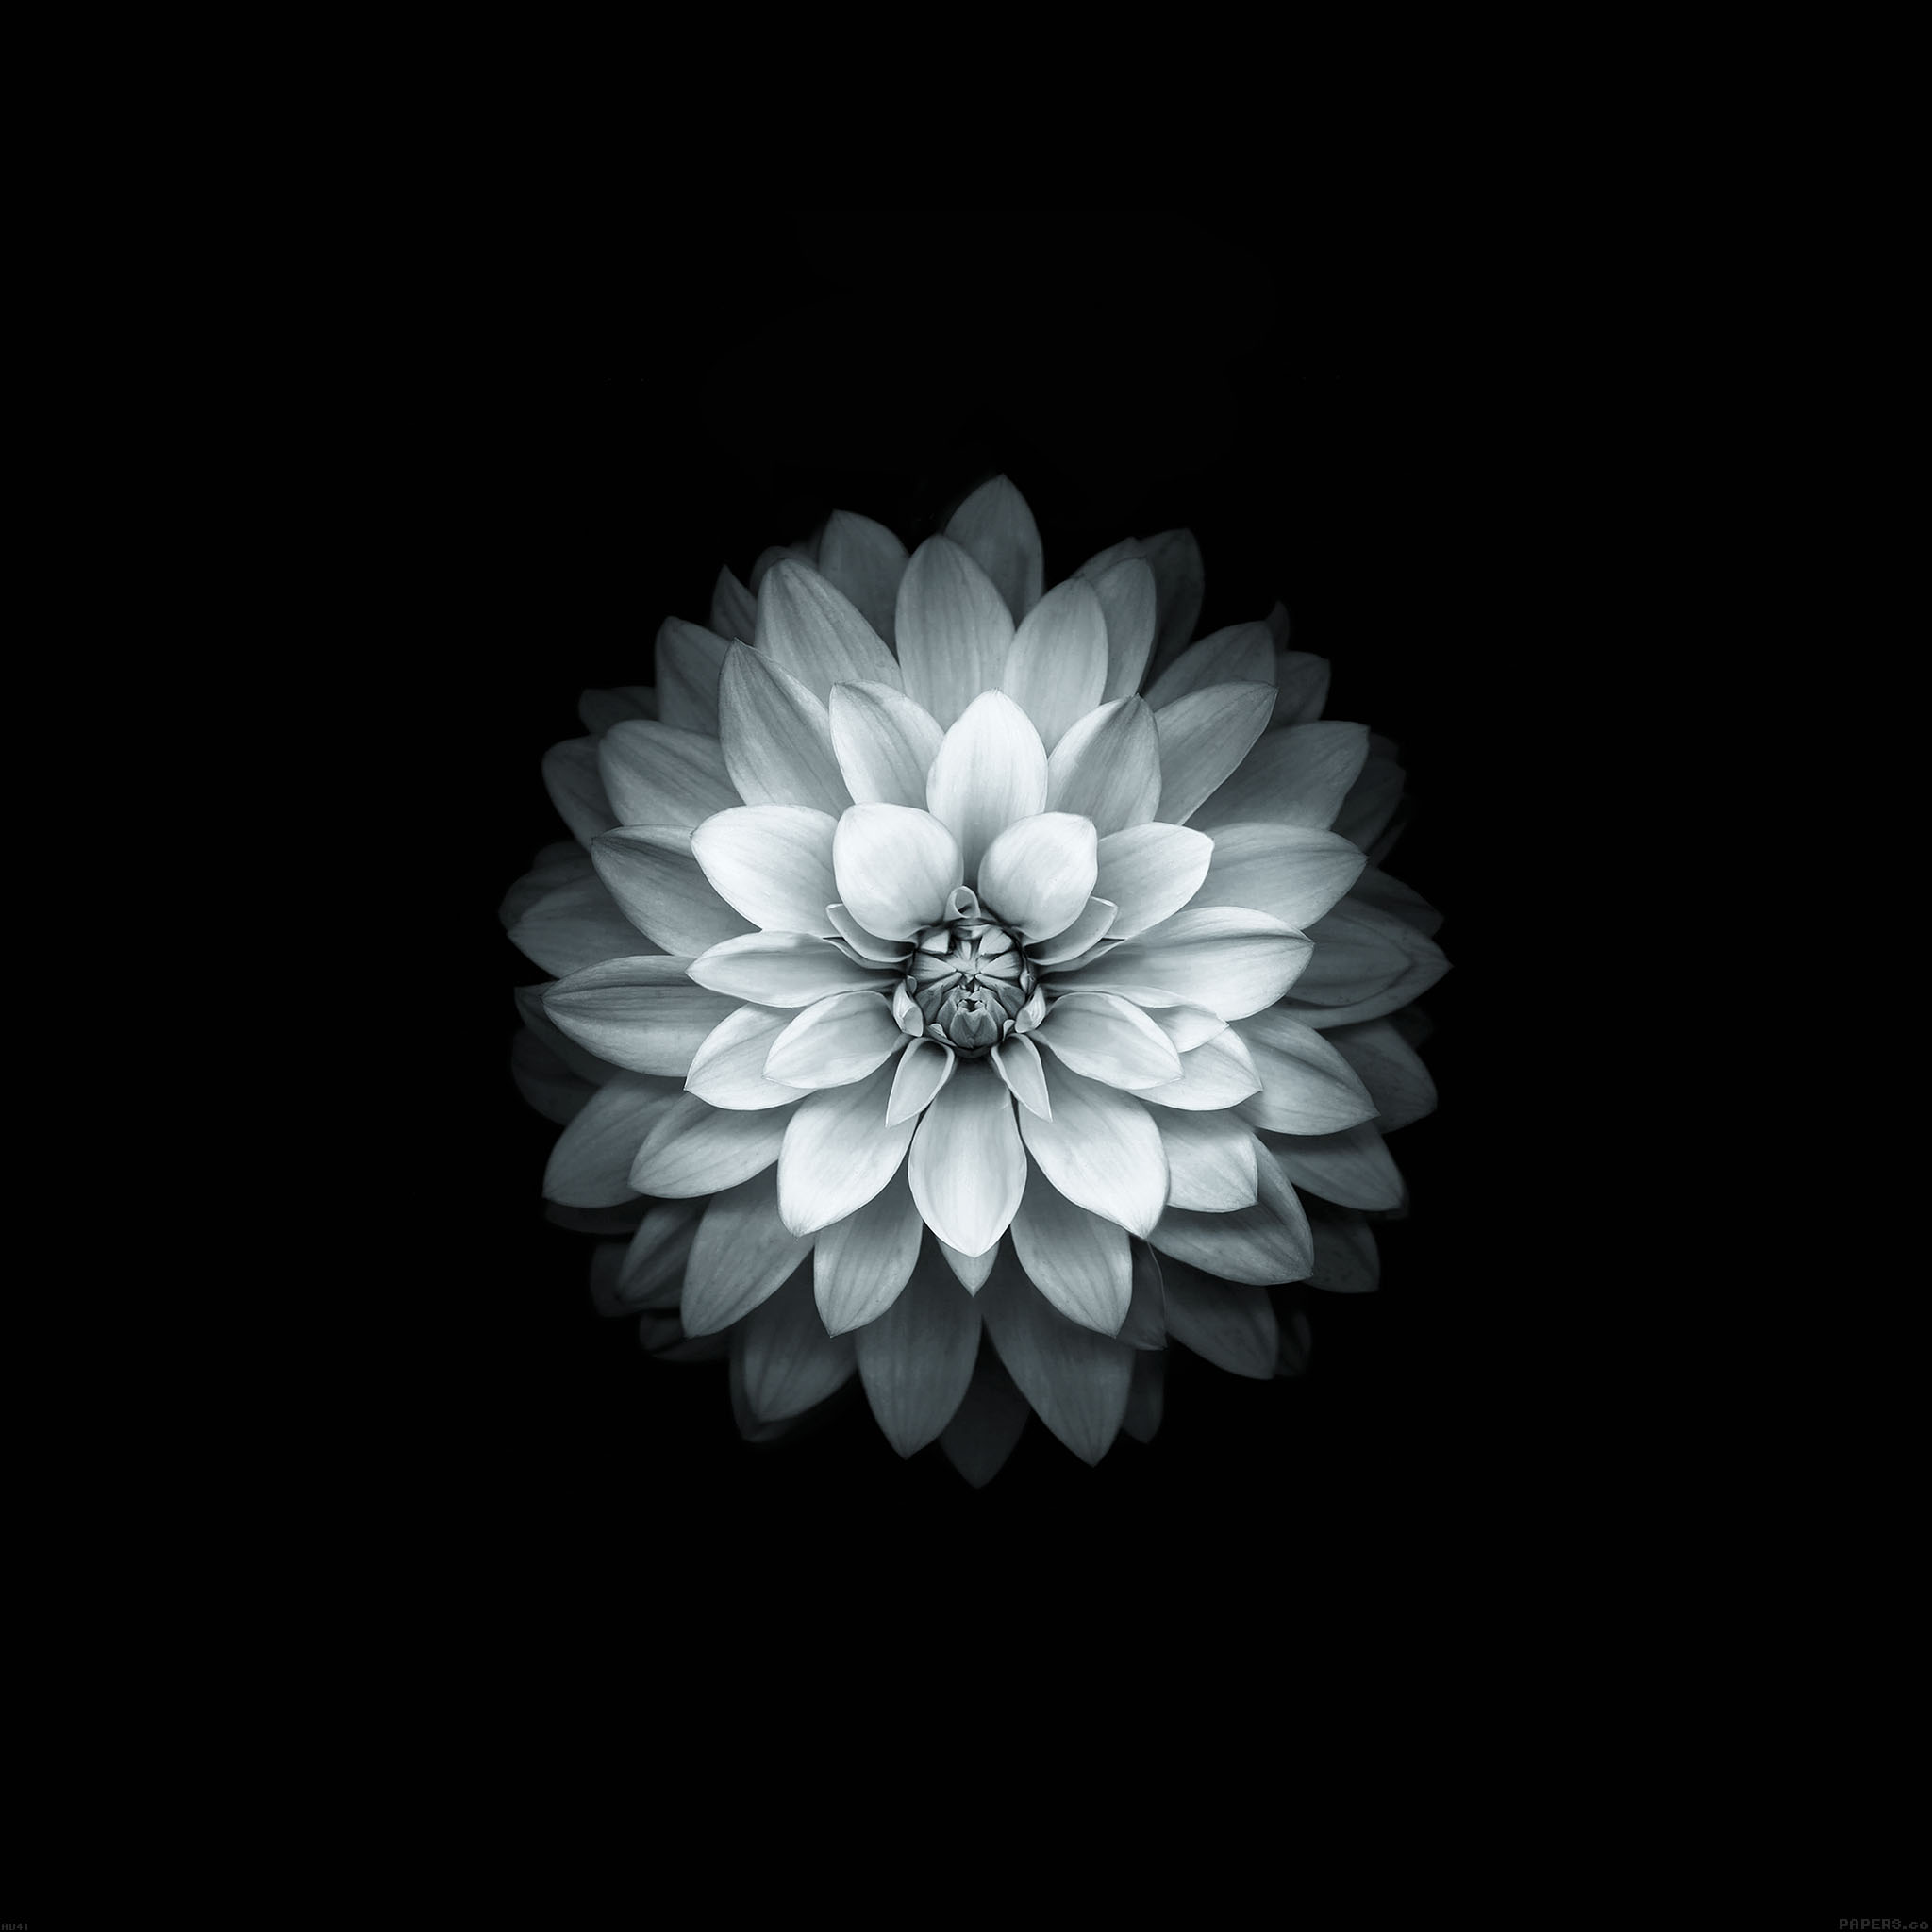 Ad41 Apple White Lotus Iphone6 Plus Ios8 Flower Wallpaper